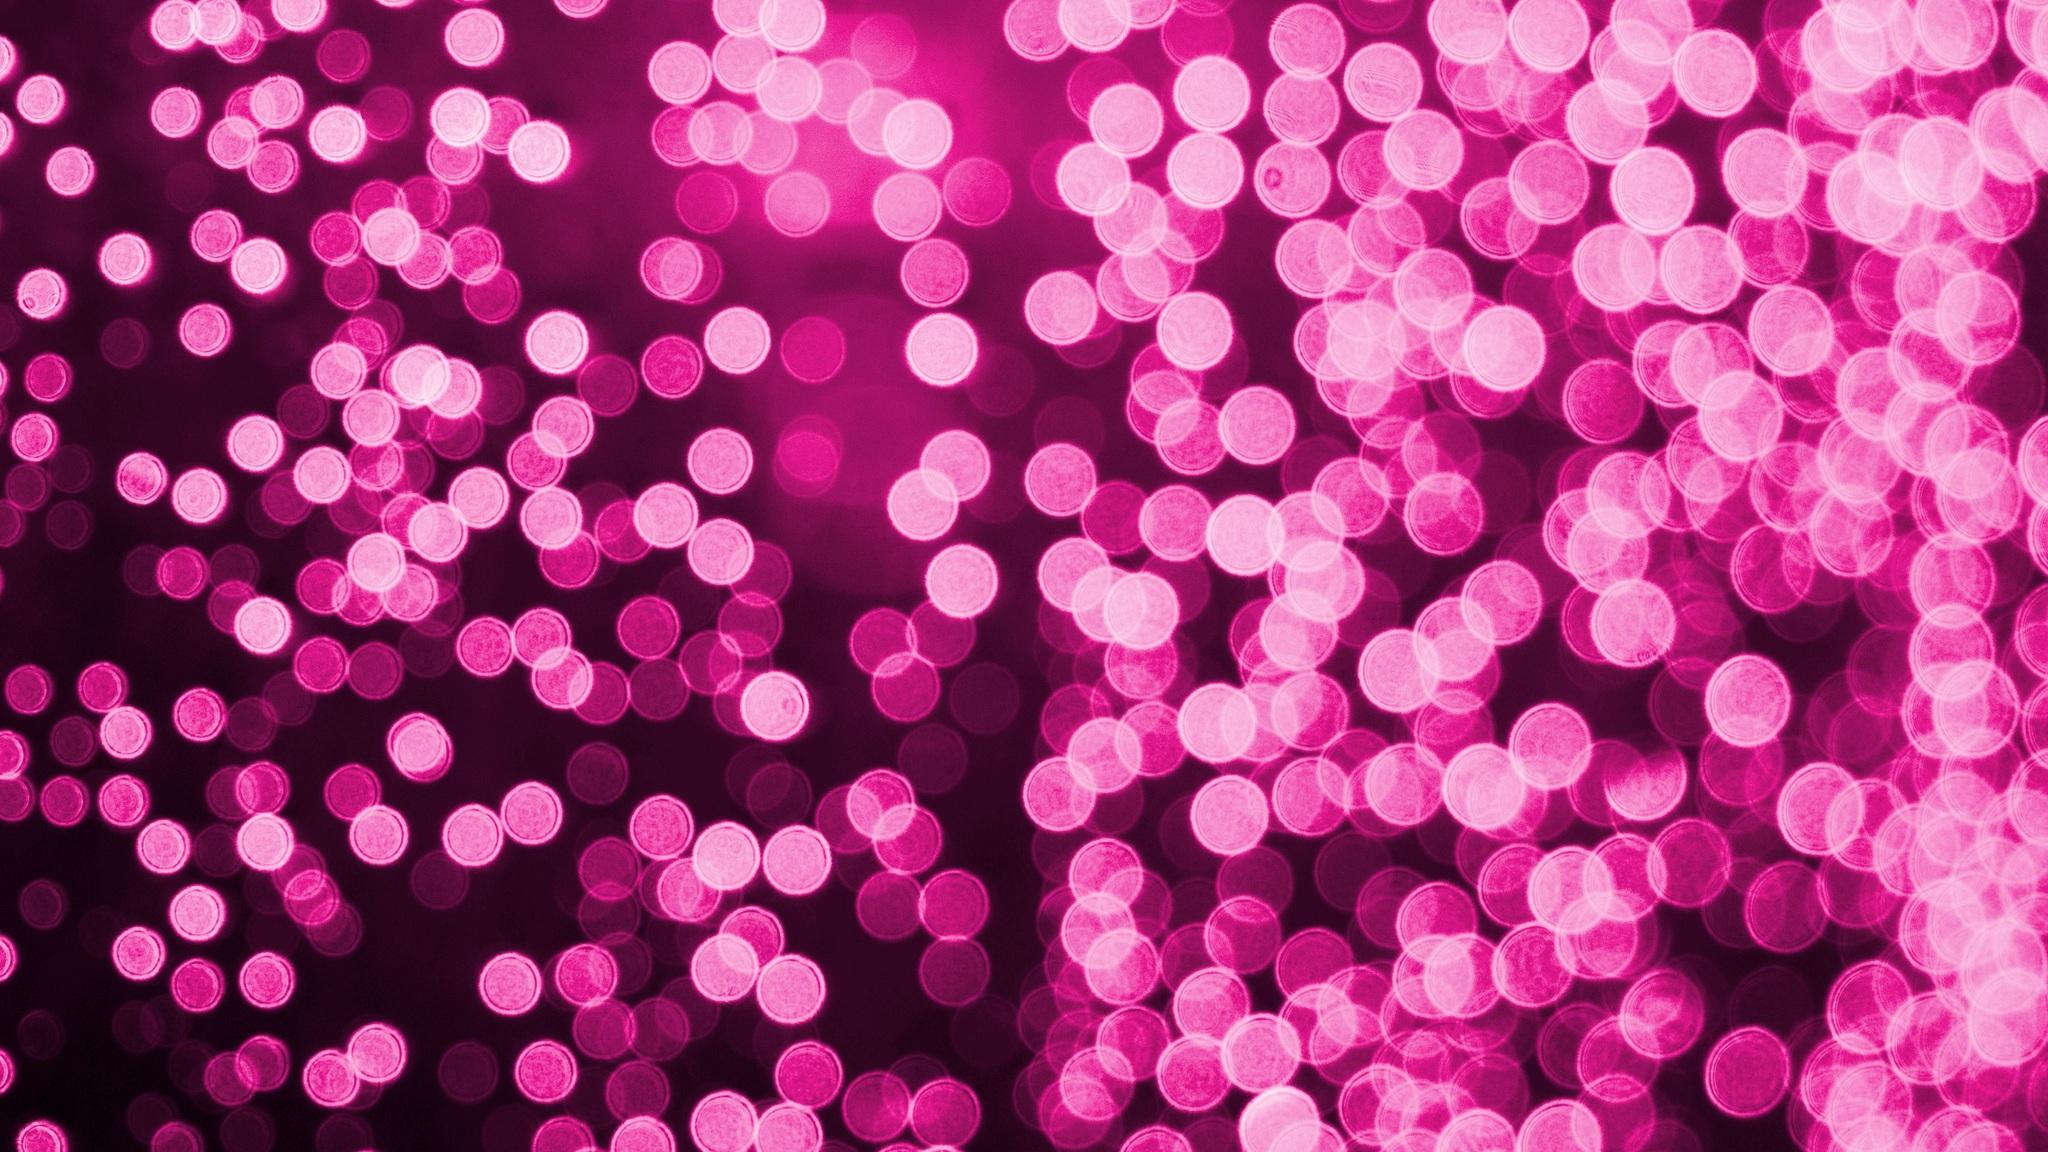 2048x1152 bokeh effect pink lights celebrations 2048x1152 - Pink wallpaper 4k ...